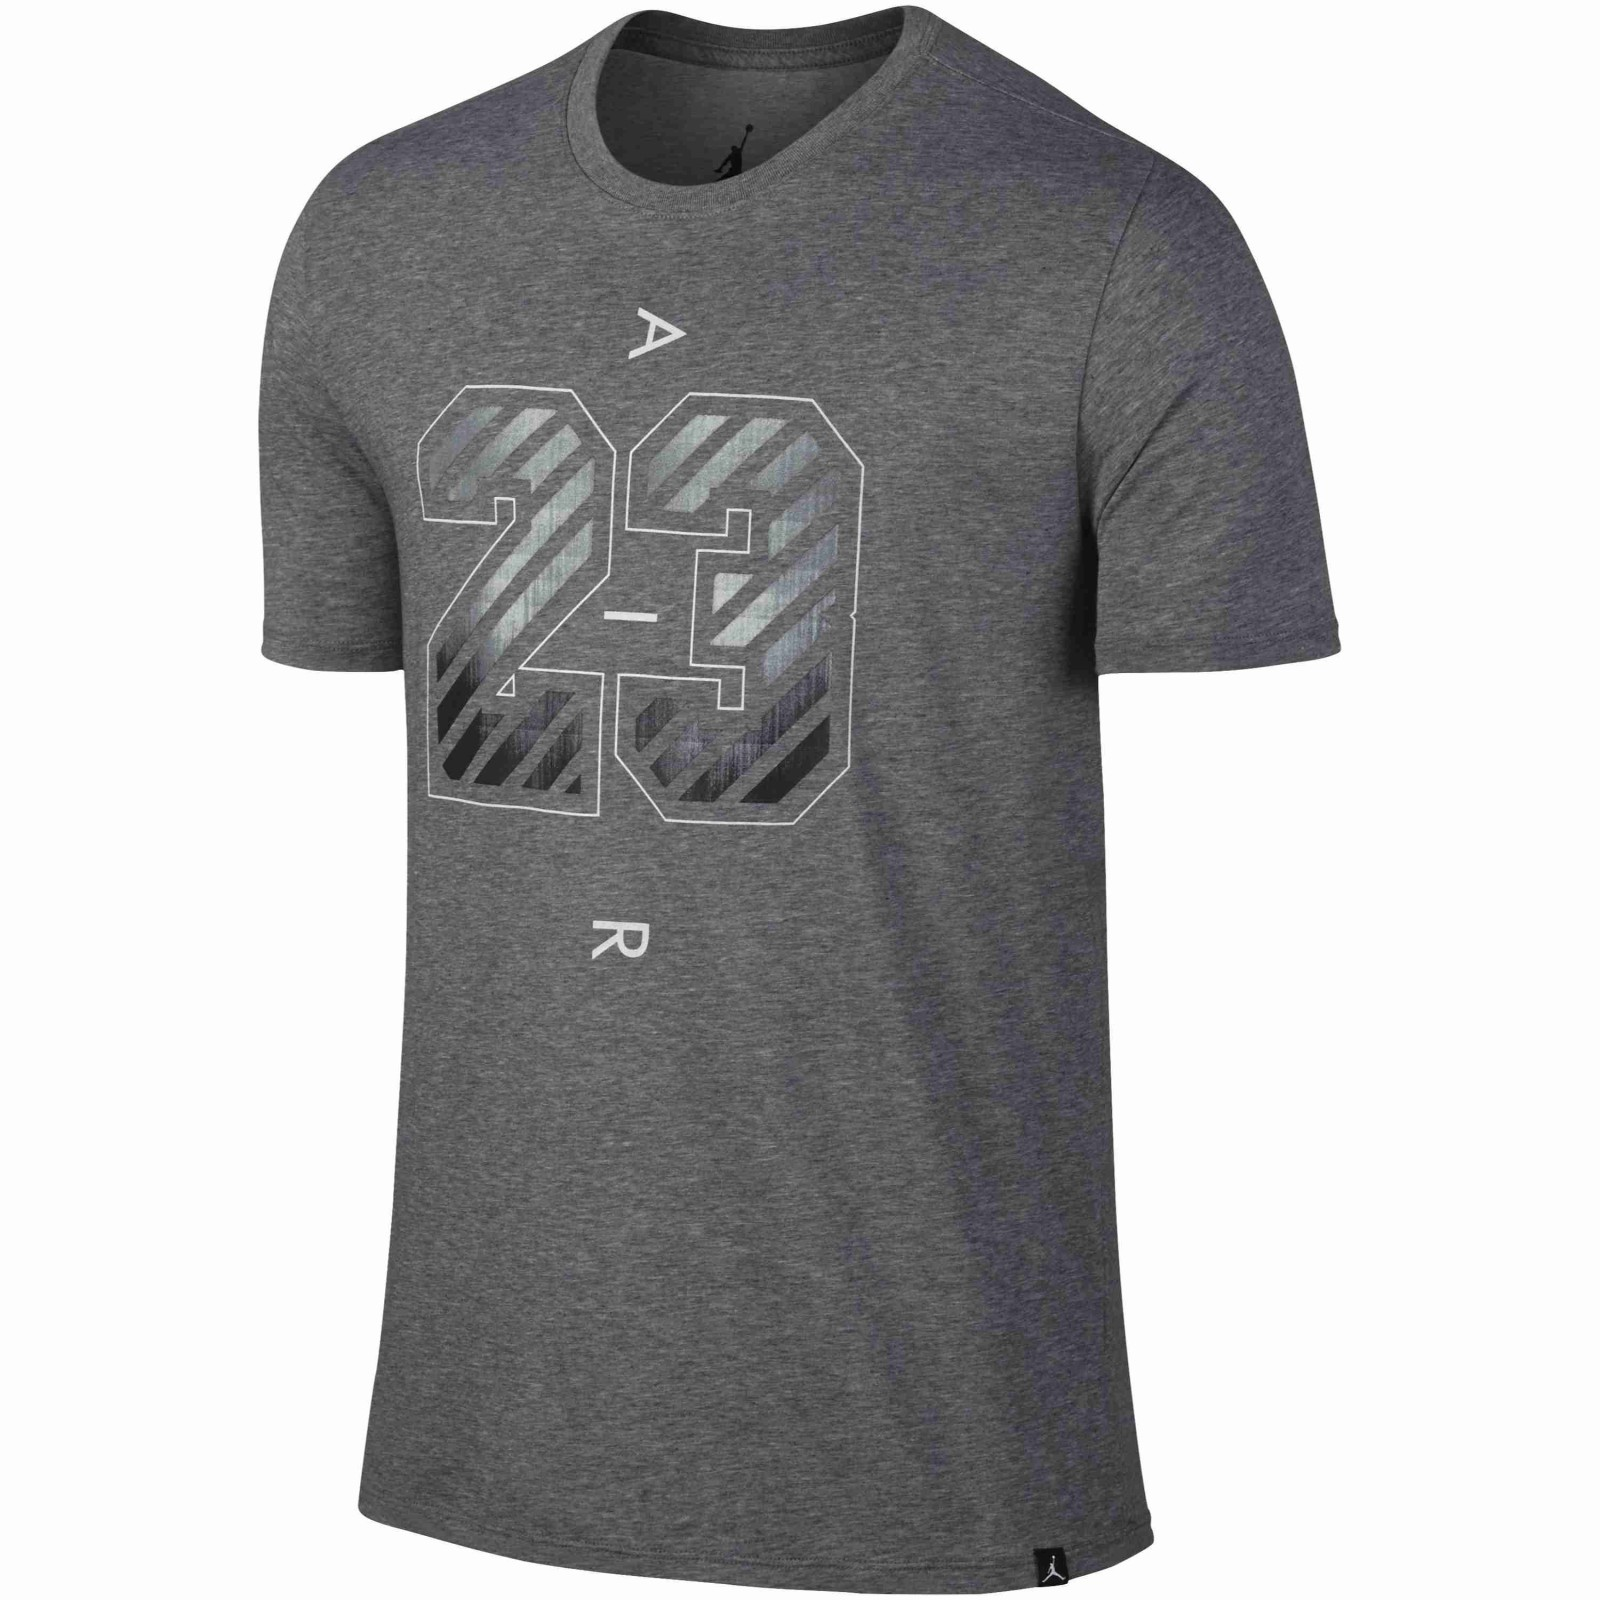 Pánské tričko Jordan 23 AIR DRI-FIT TEE  d2d141d947